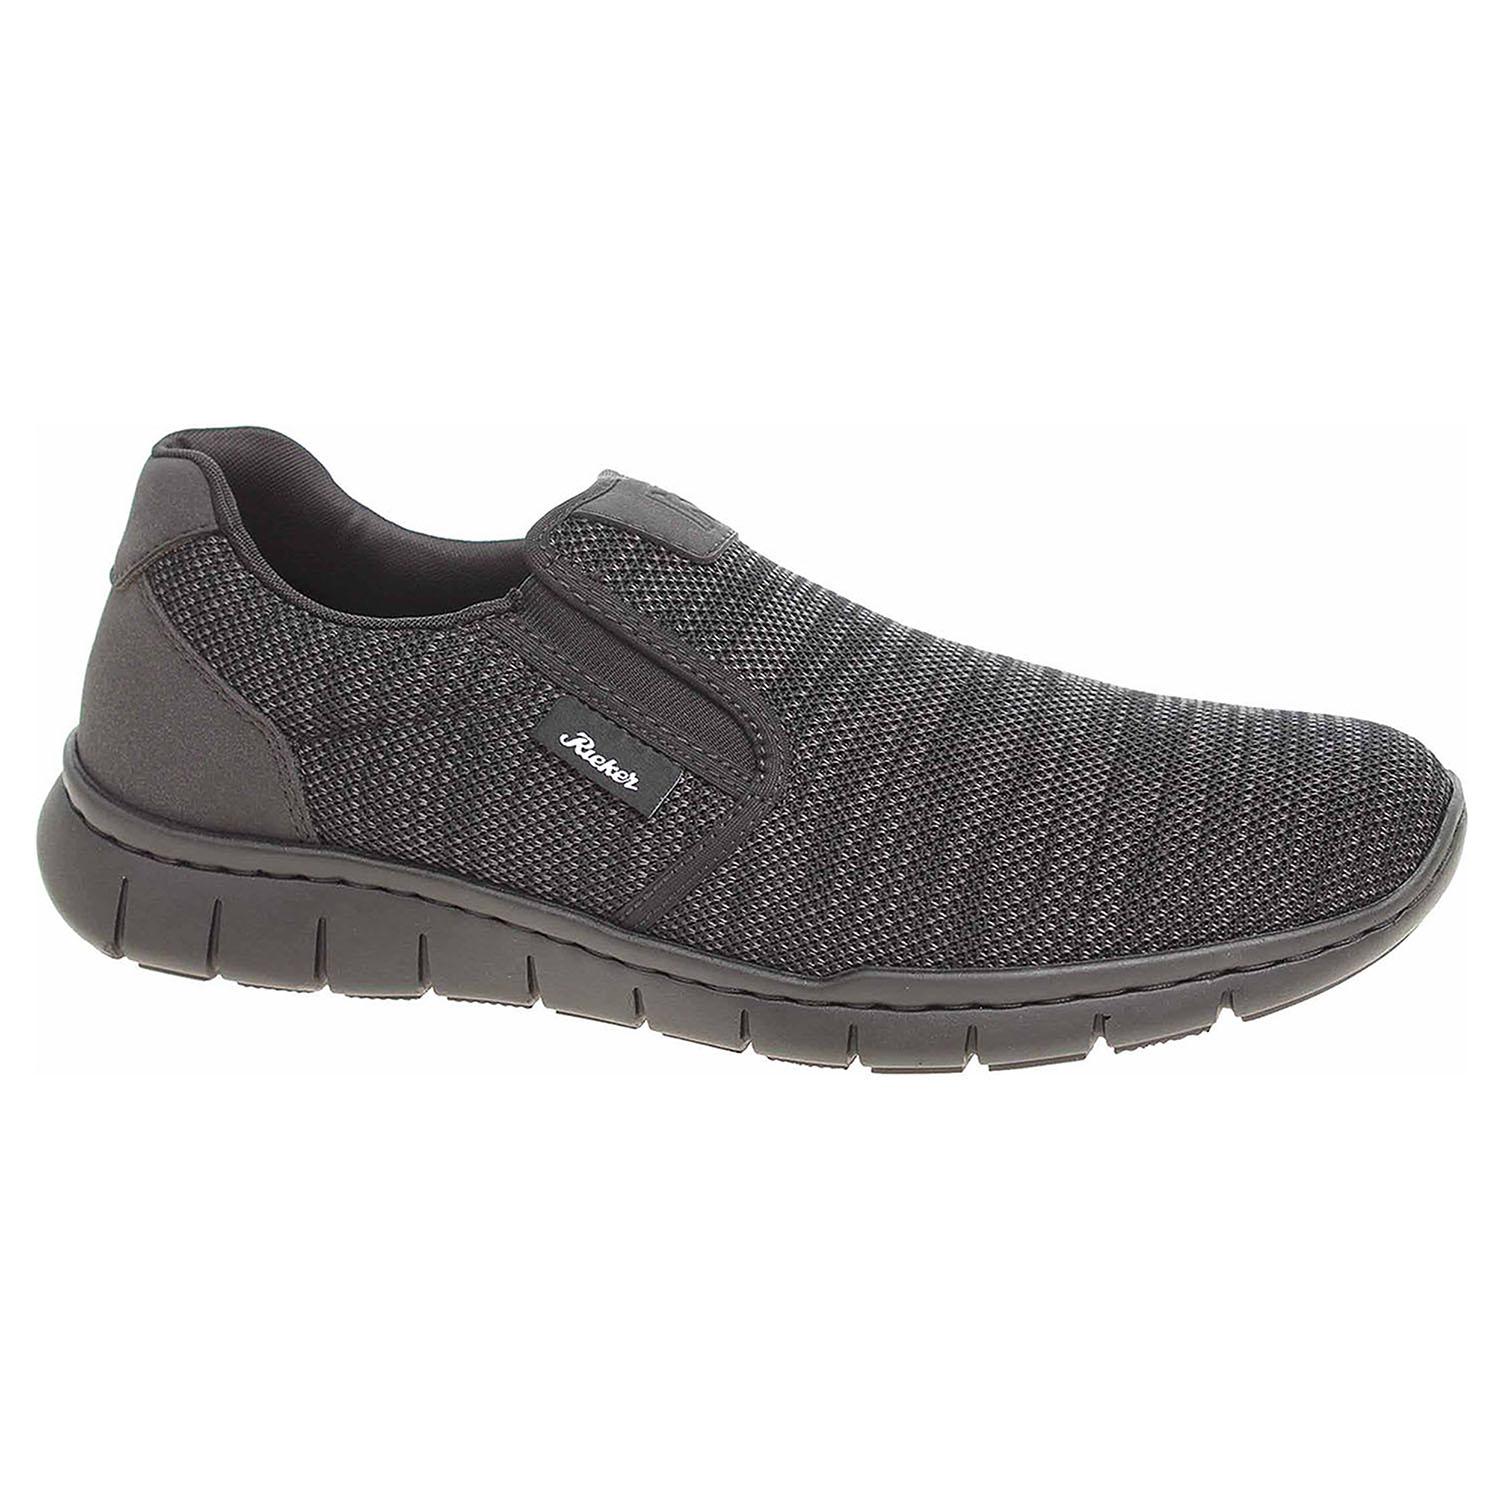 Pánská obuv Rieker B8760-42 grau kombi B8760-42 41